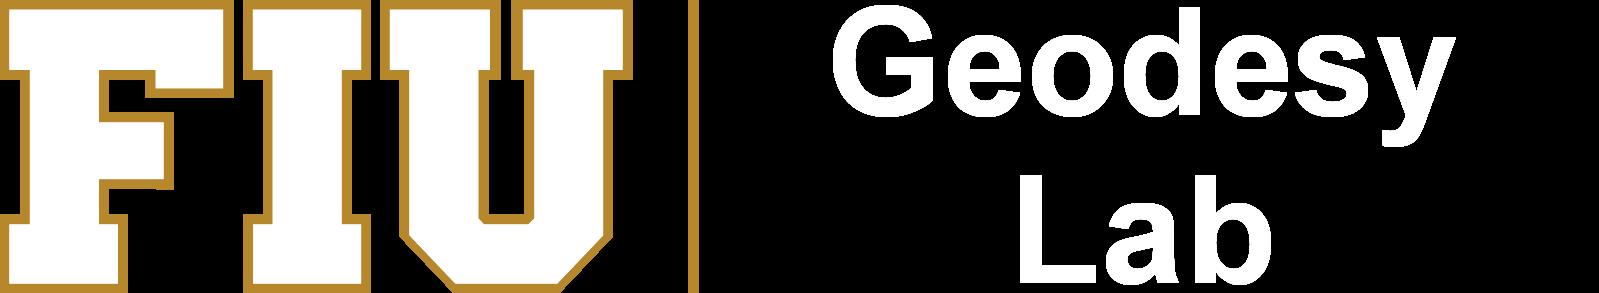 Fiu geodesy lab logo. Earthquake clipart san andreas fault